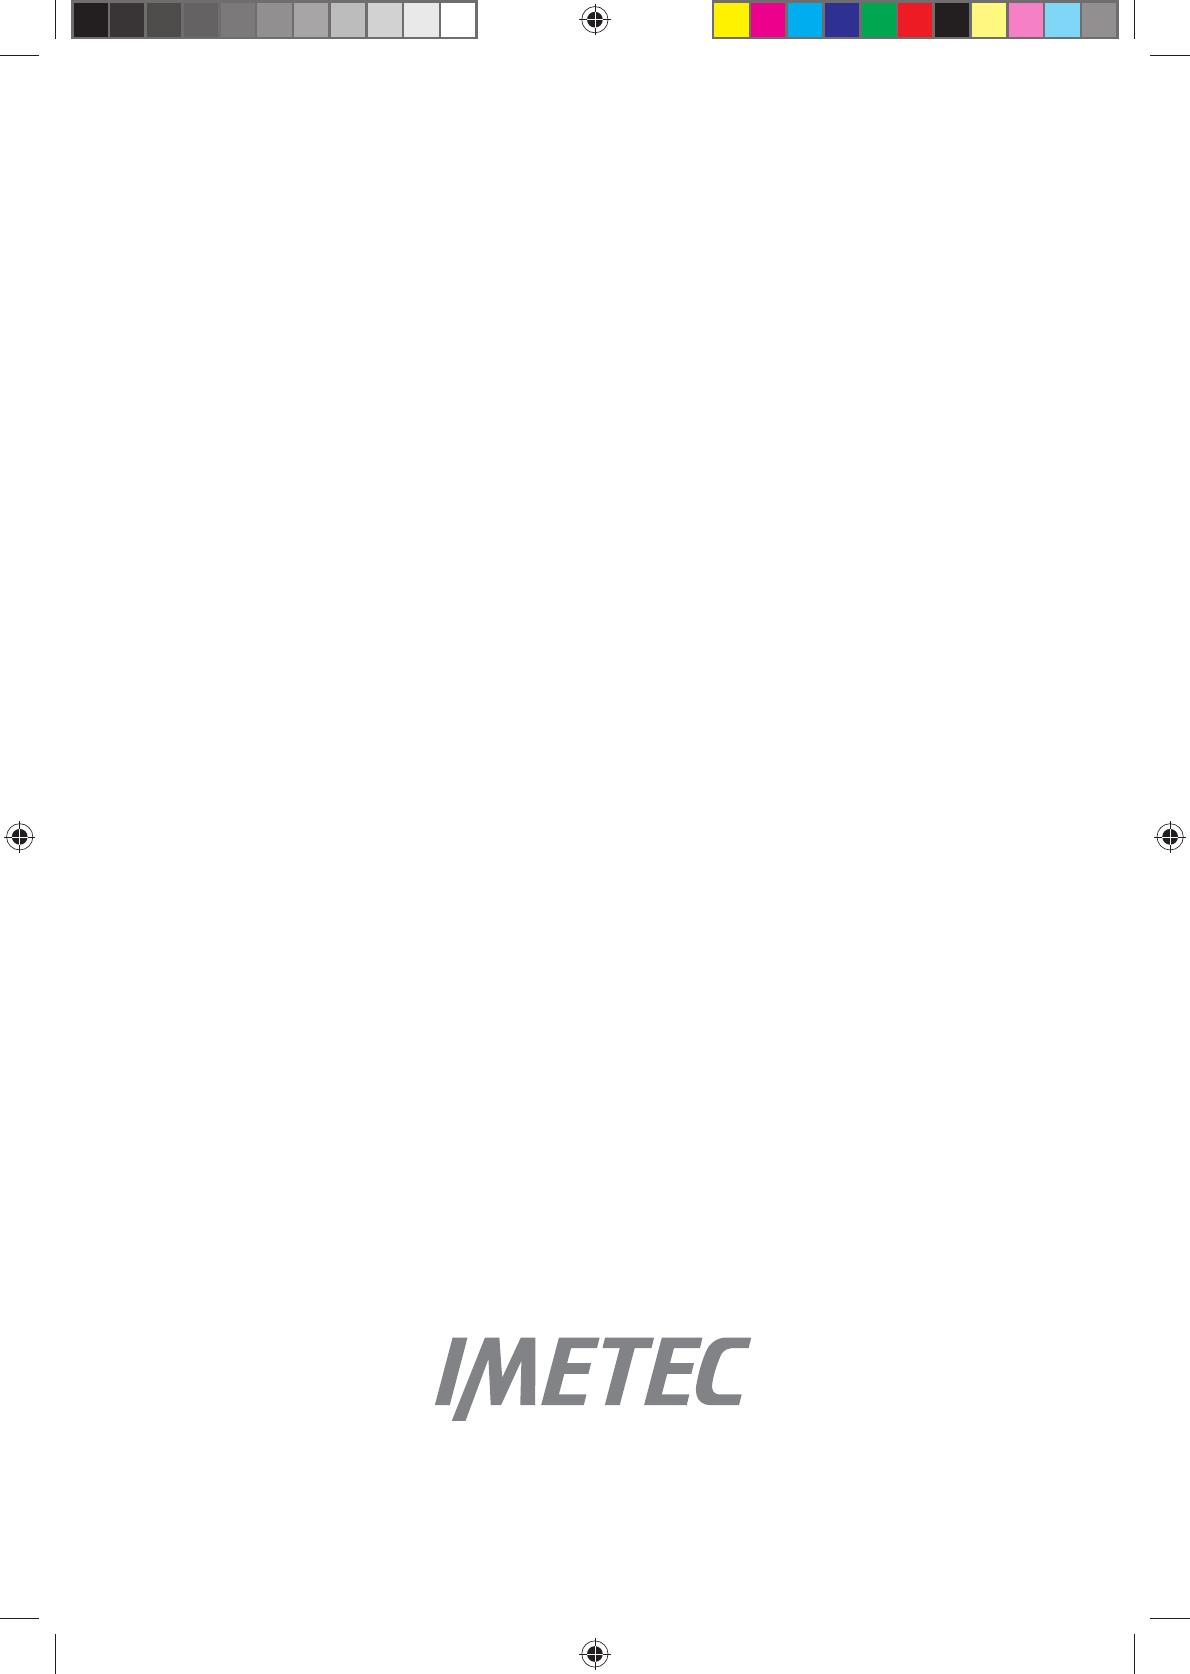 Imetec Eco Fh4 300.Prirucnik Imetec Eco Fh4 300 32 Stranica